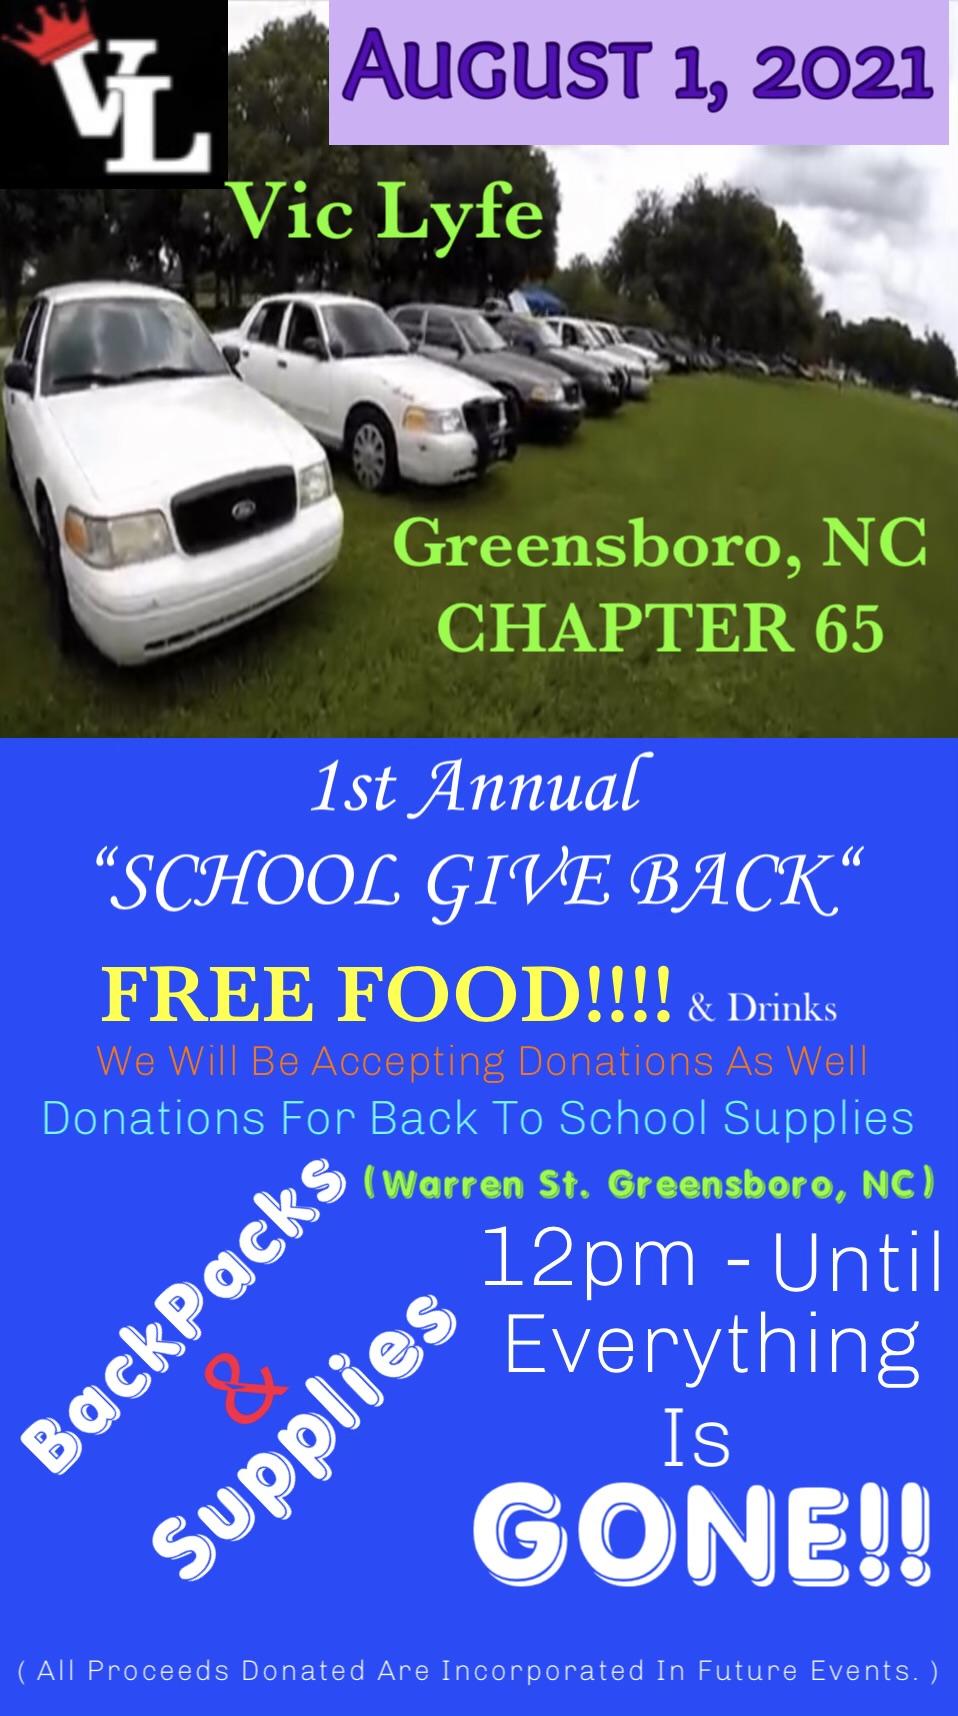 School Give Back